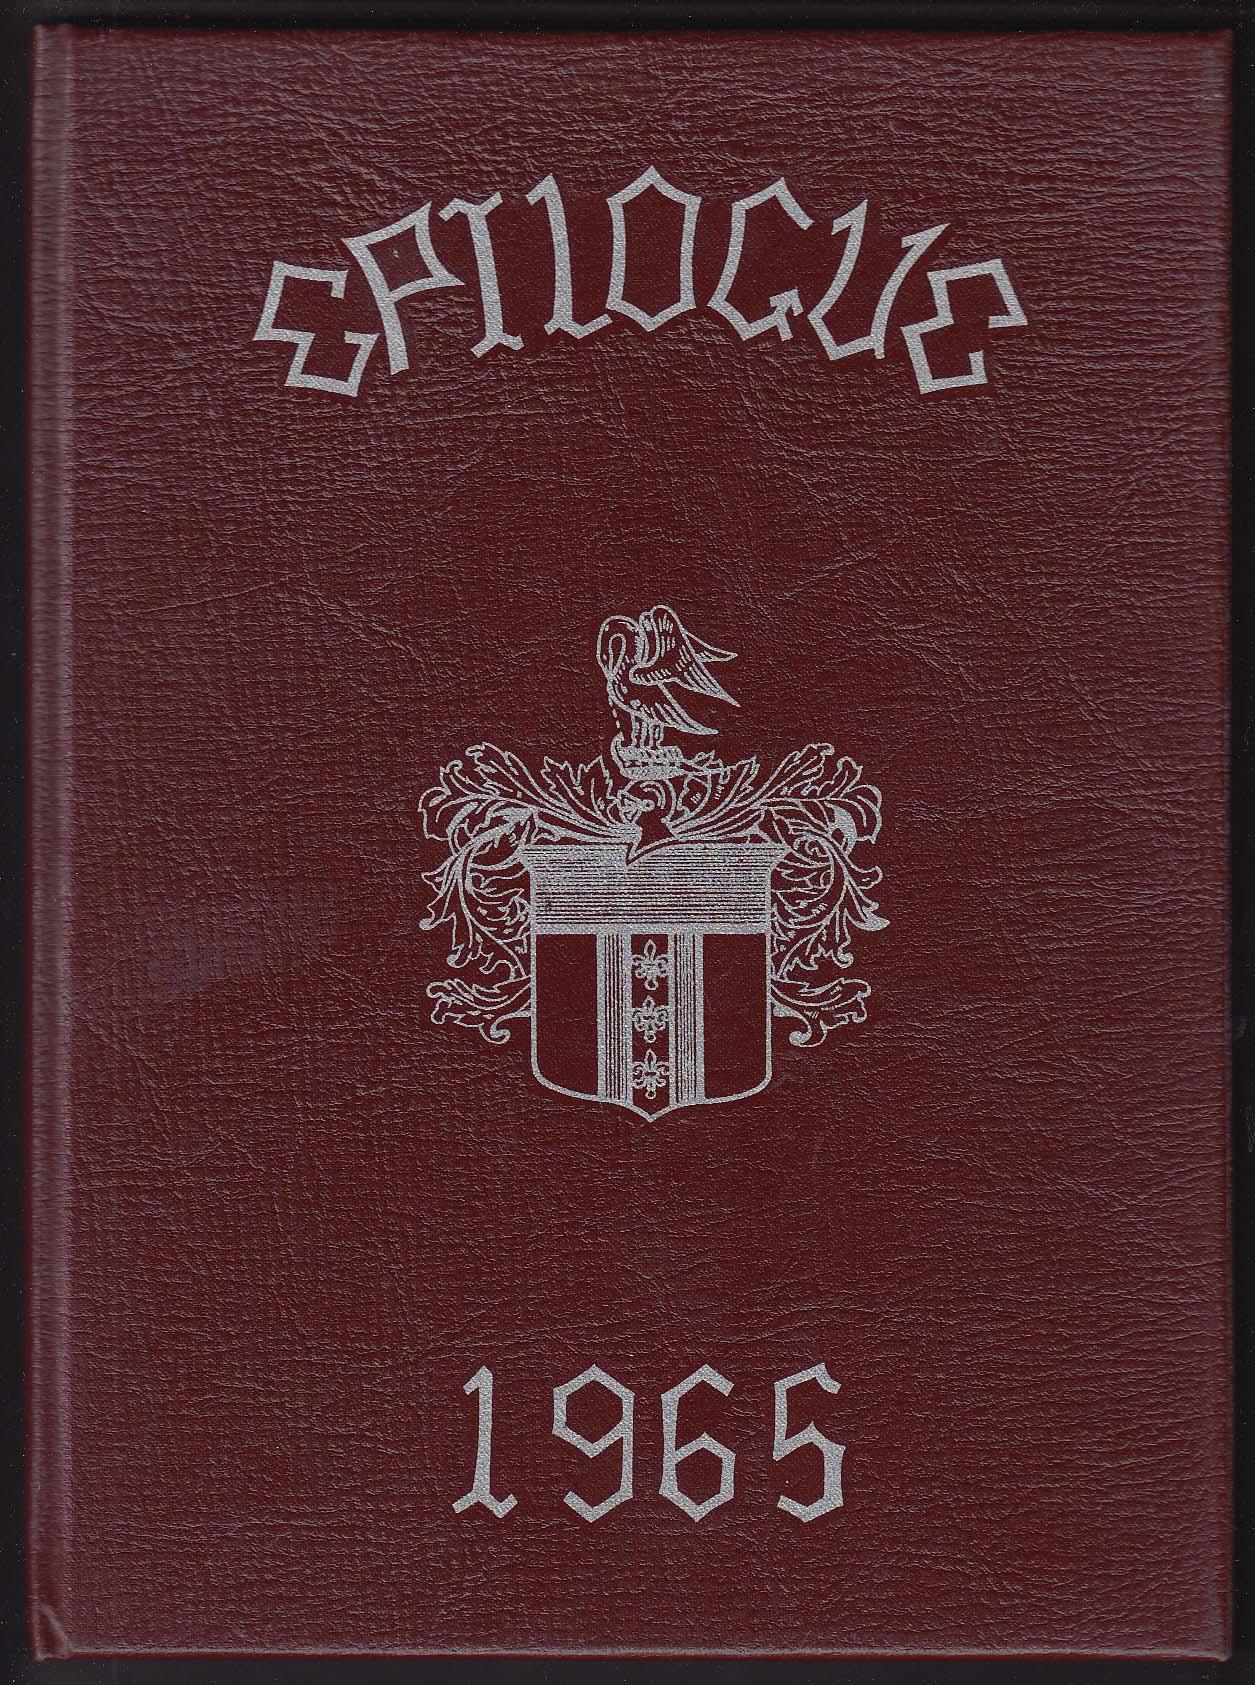 Epilogue 1965 Yearbook Chaffee School Loomis Institute Windsor Connecticut CT